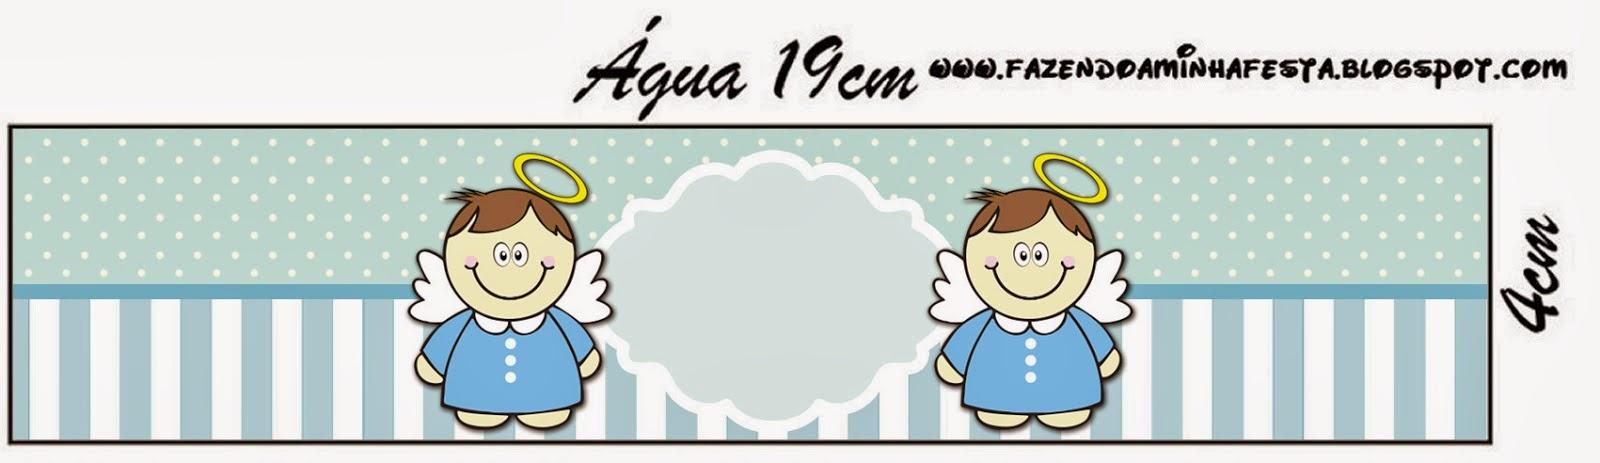 Bautismo Angelito Moreno: Etiquetas para Candy Bar para Imprimir ...